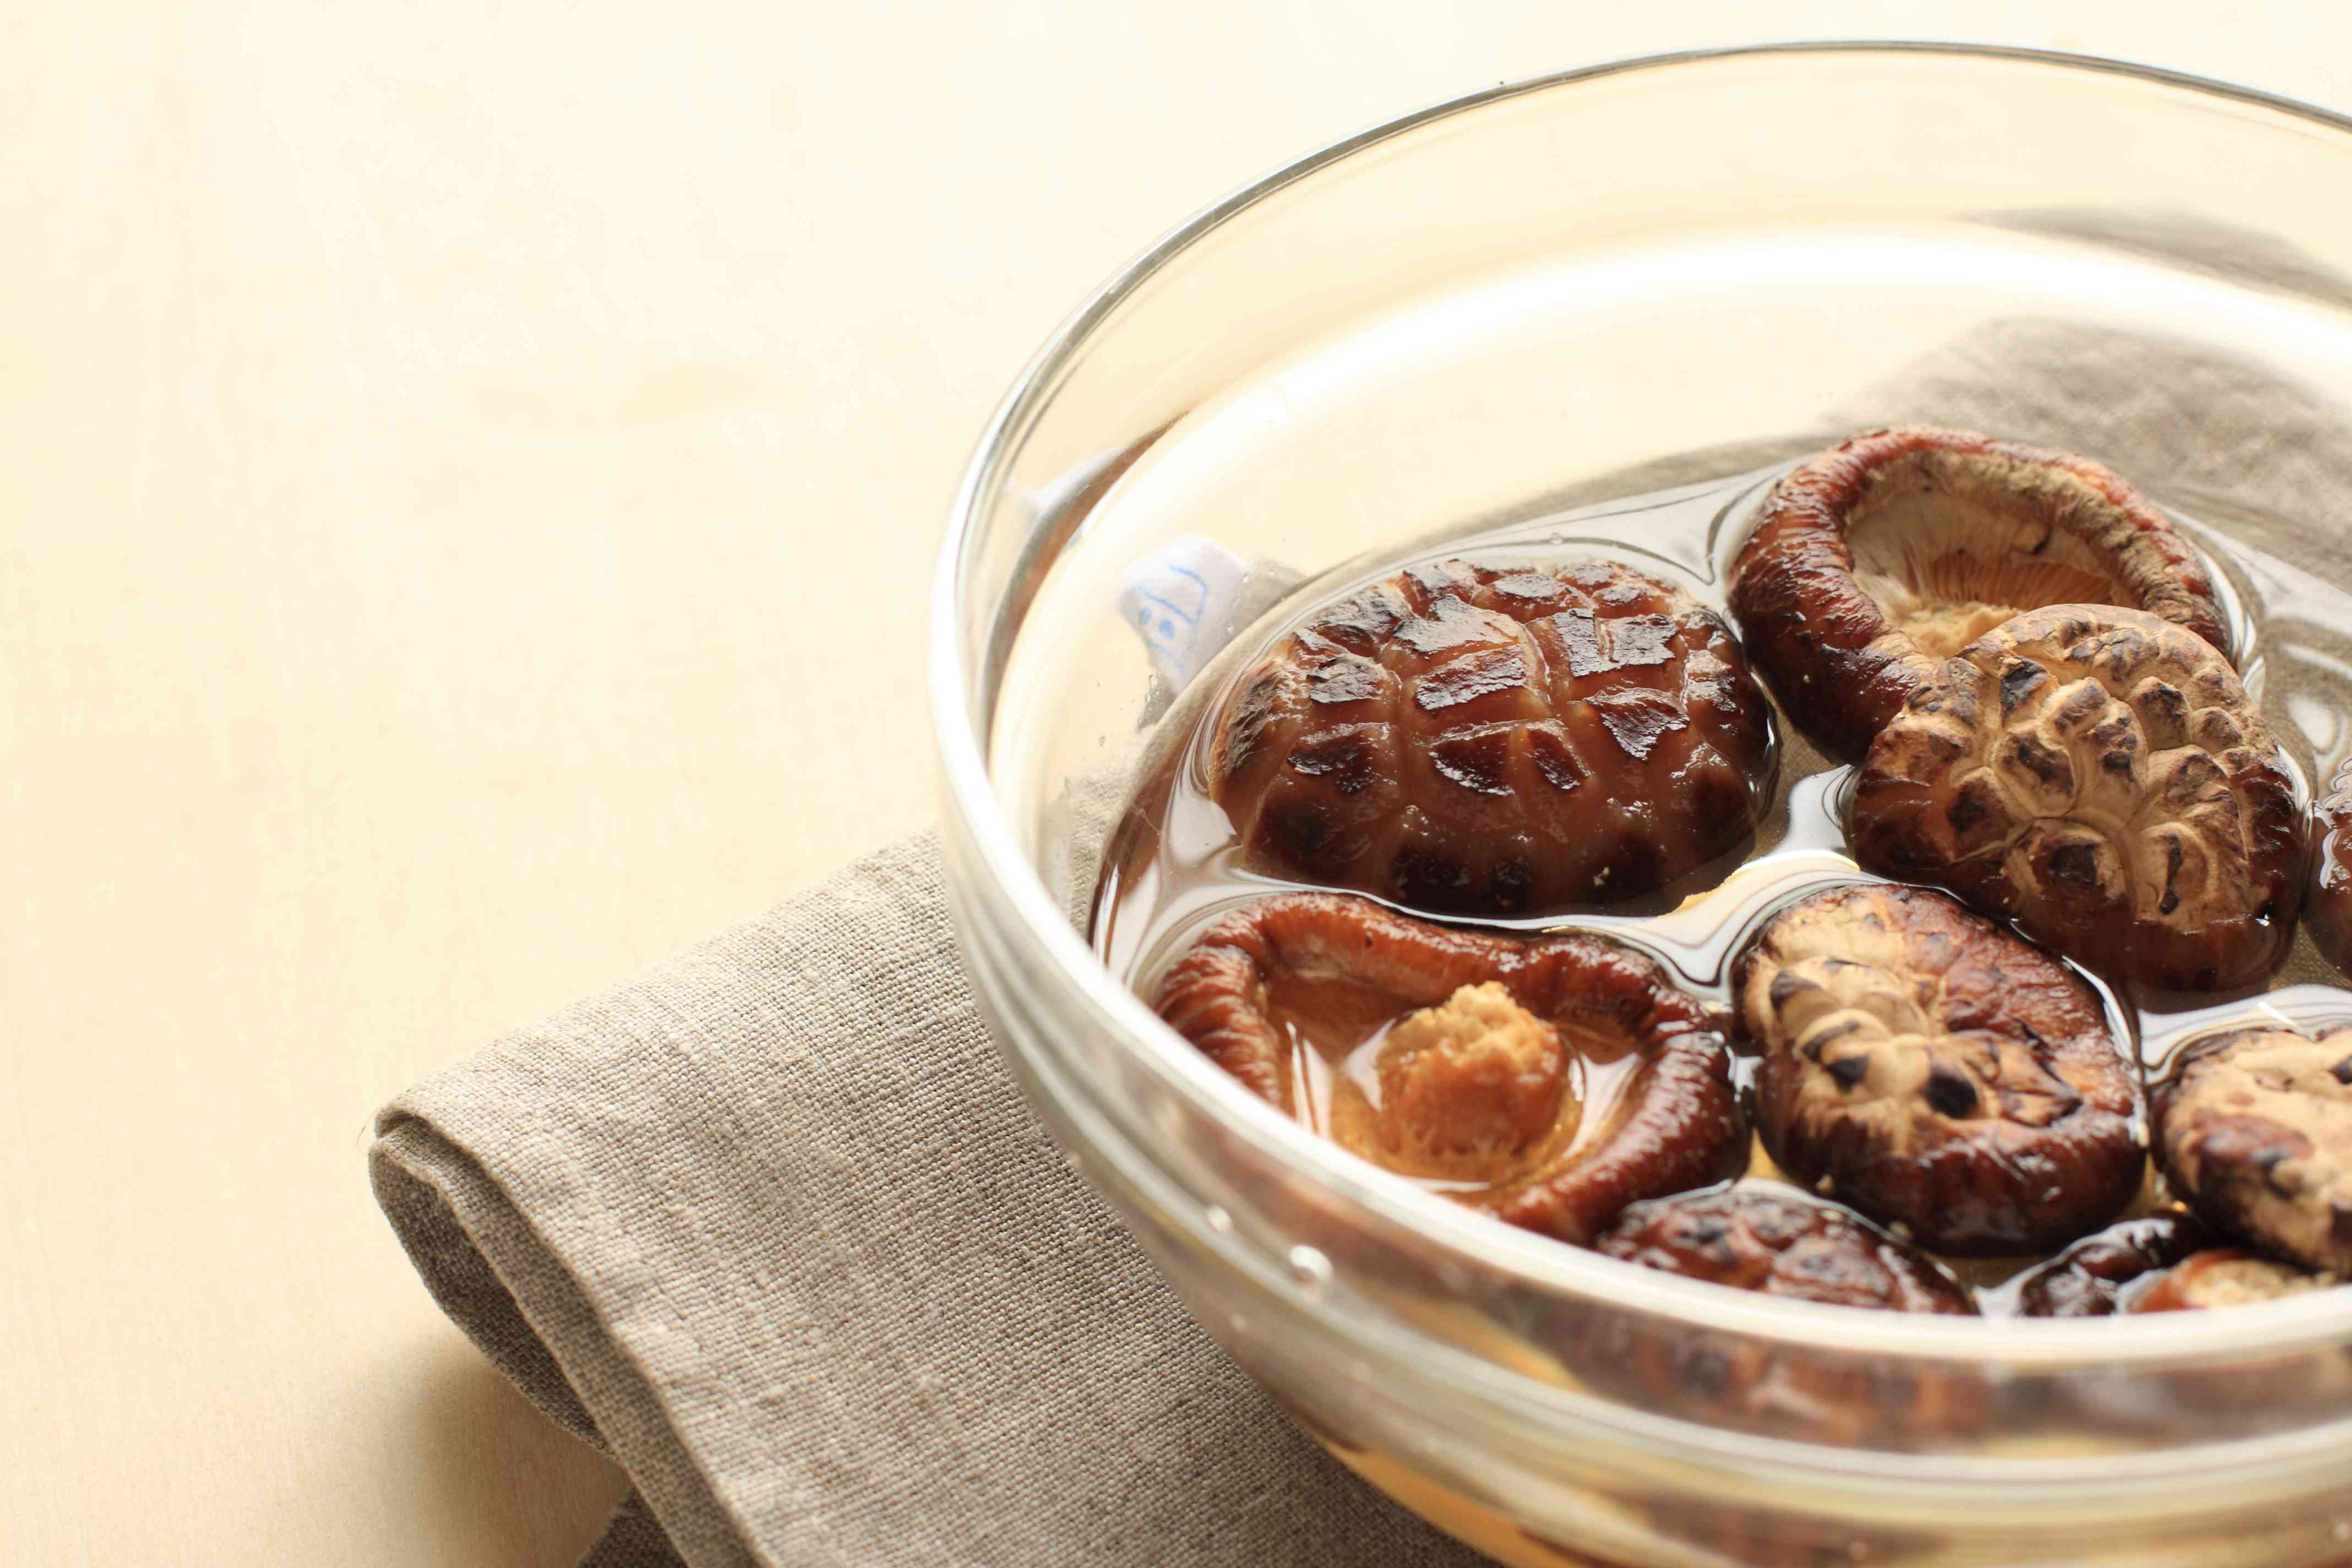 Chinese cooking, dried mushroom